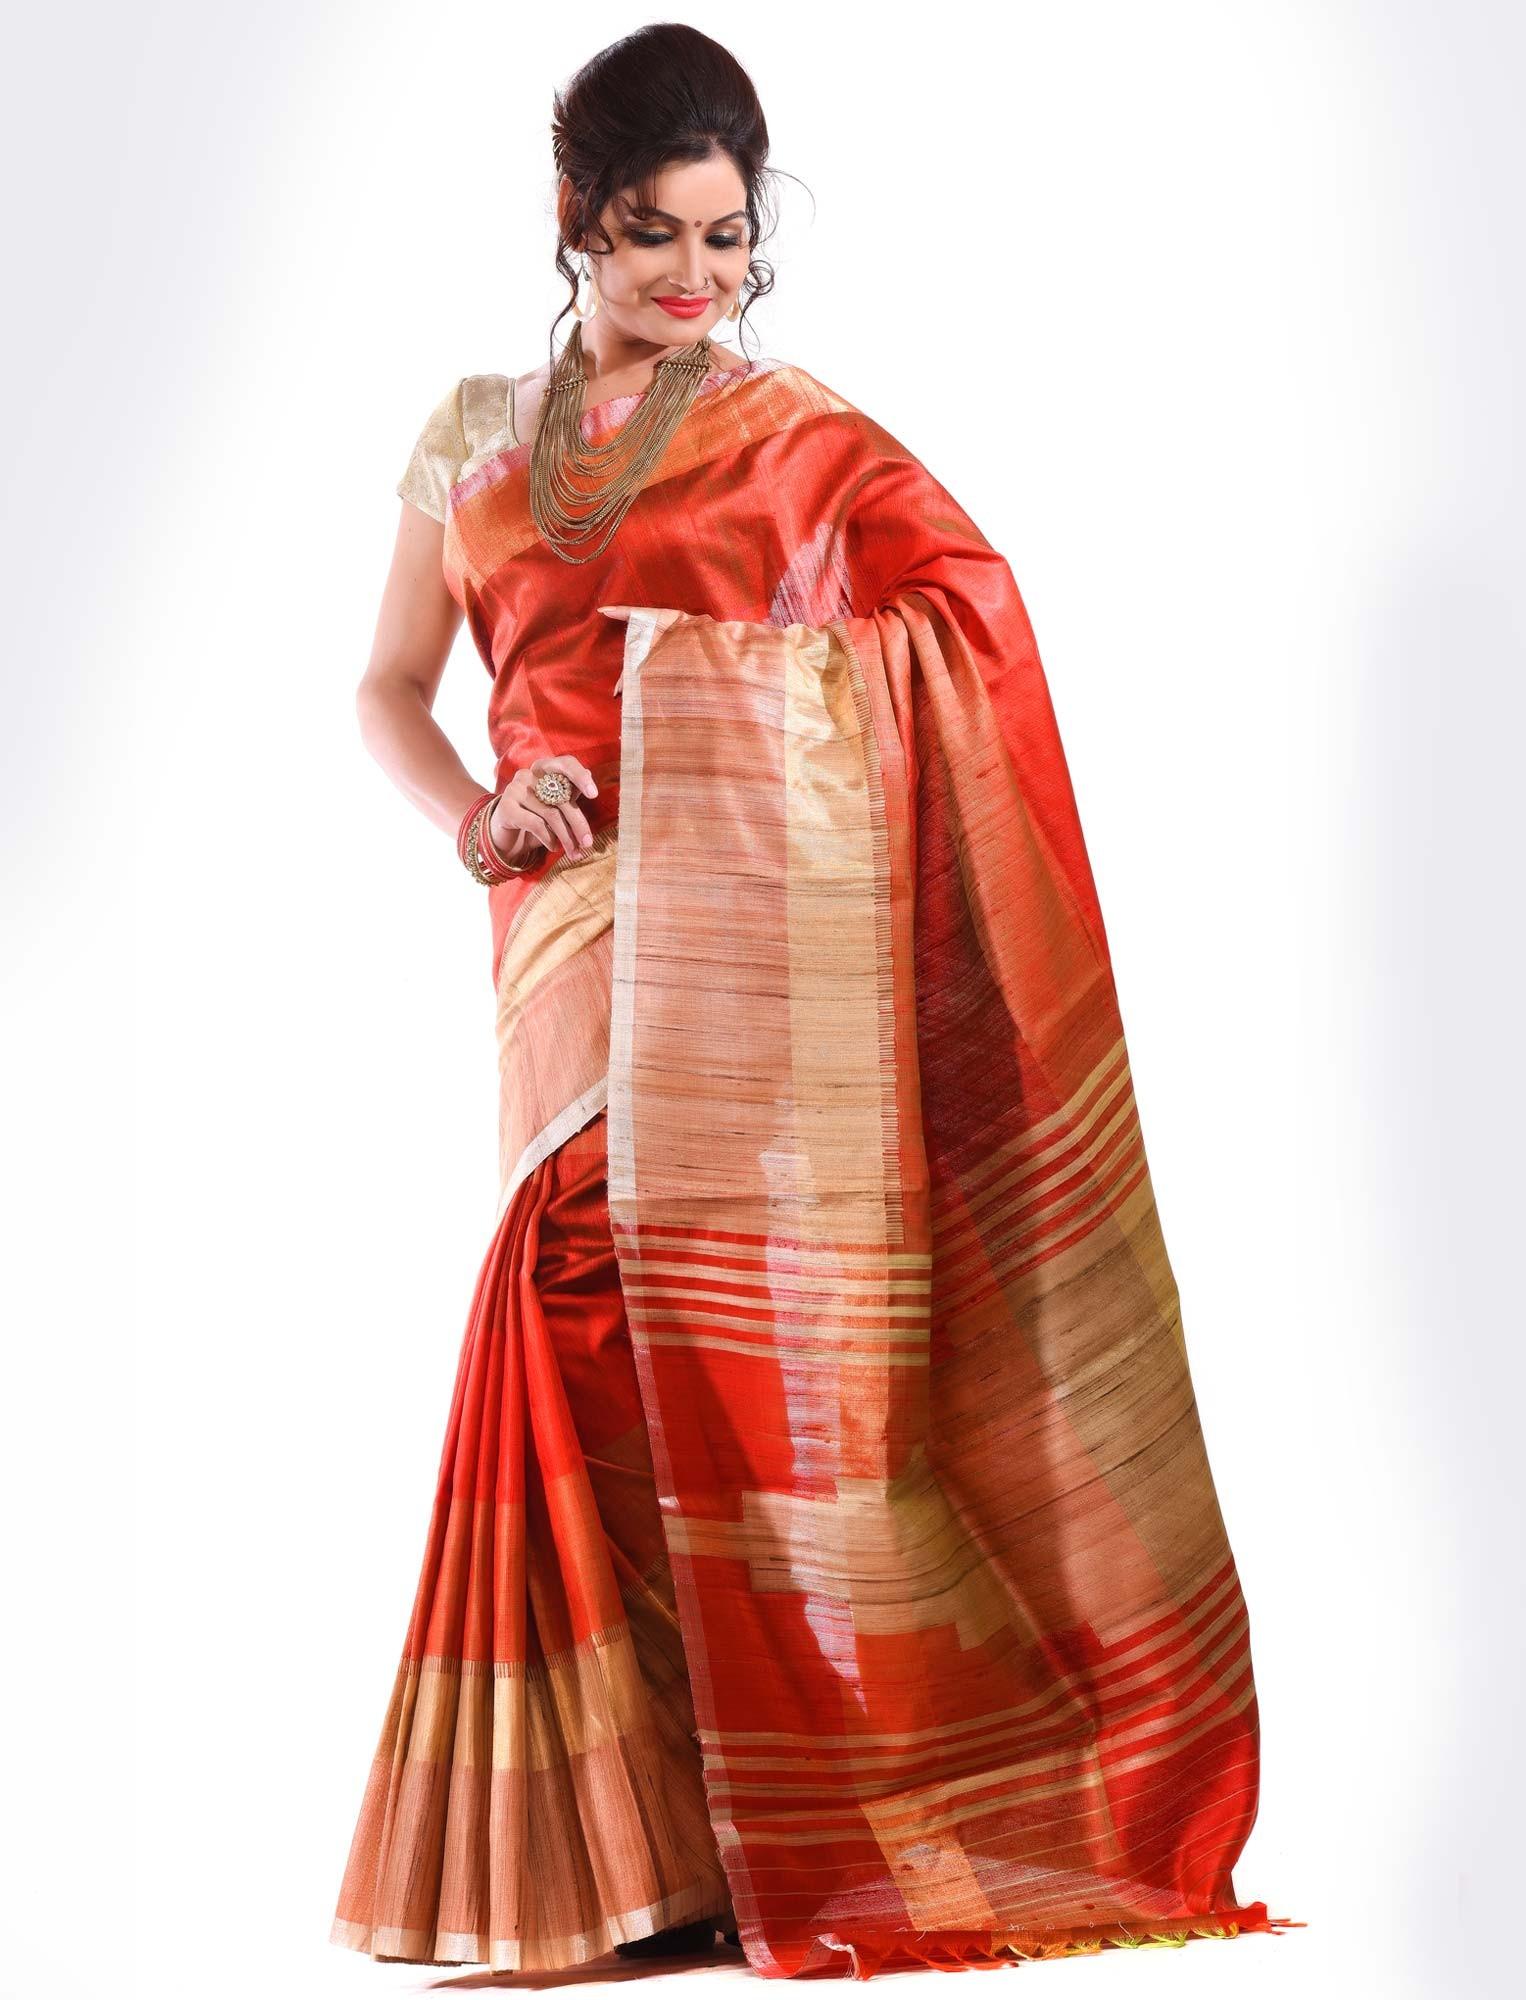 The model in Kosa Saree.